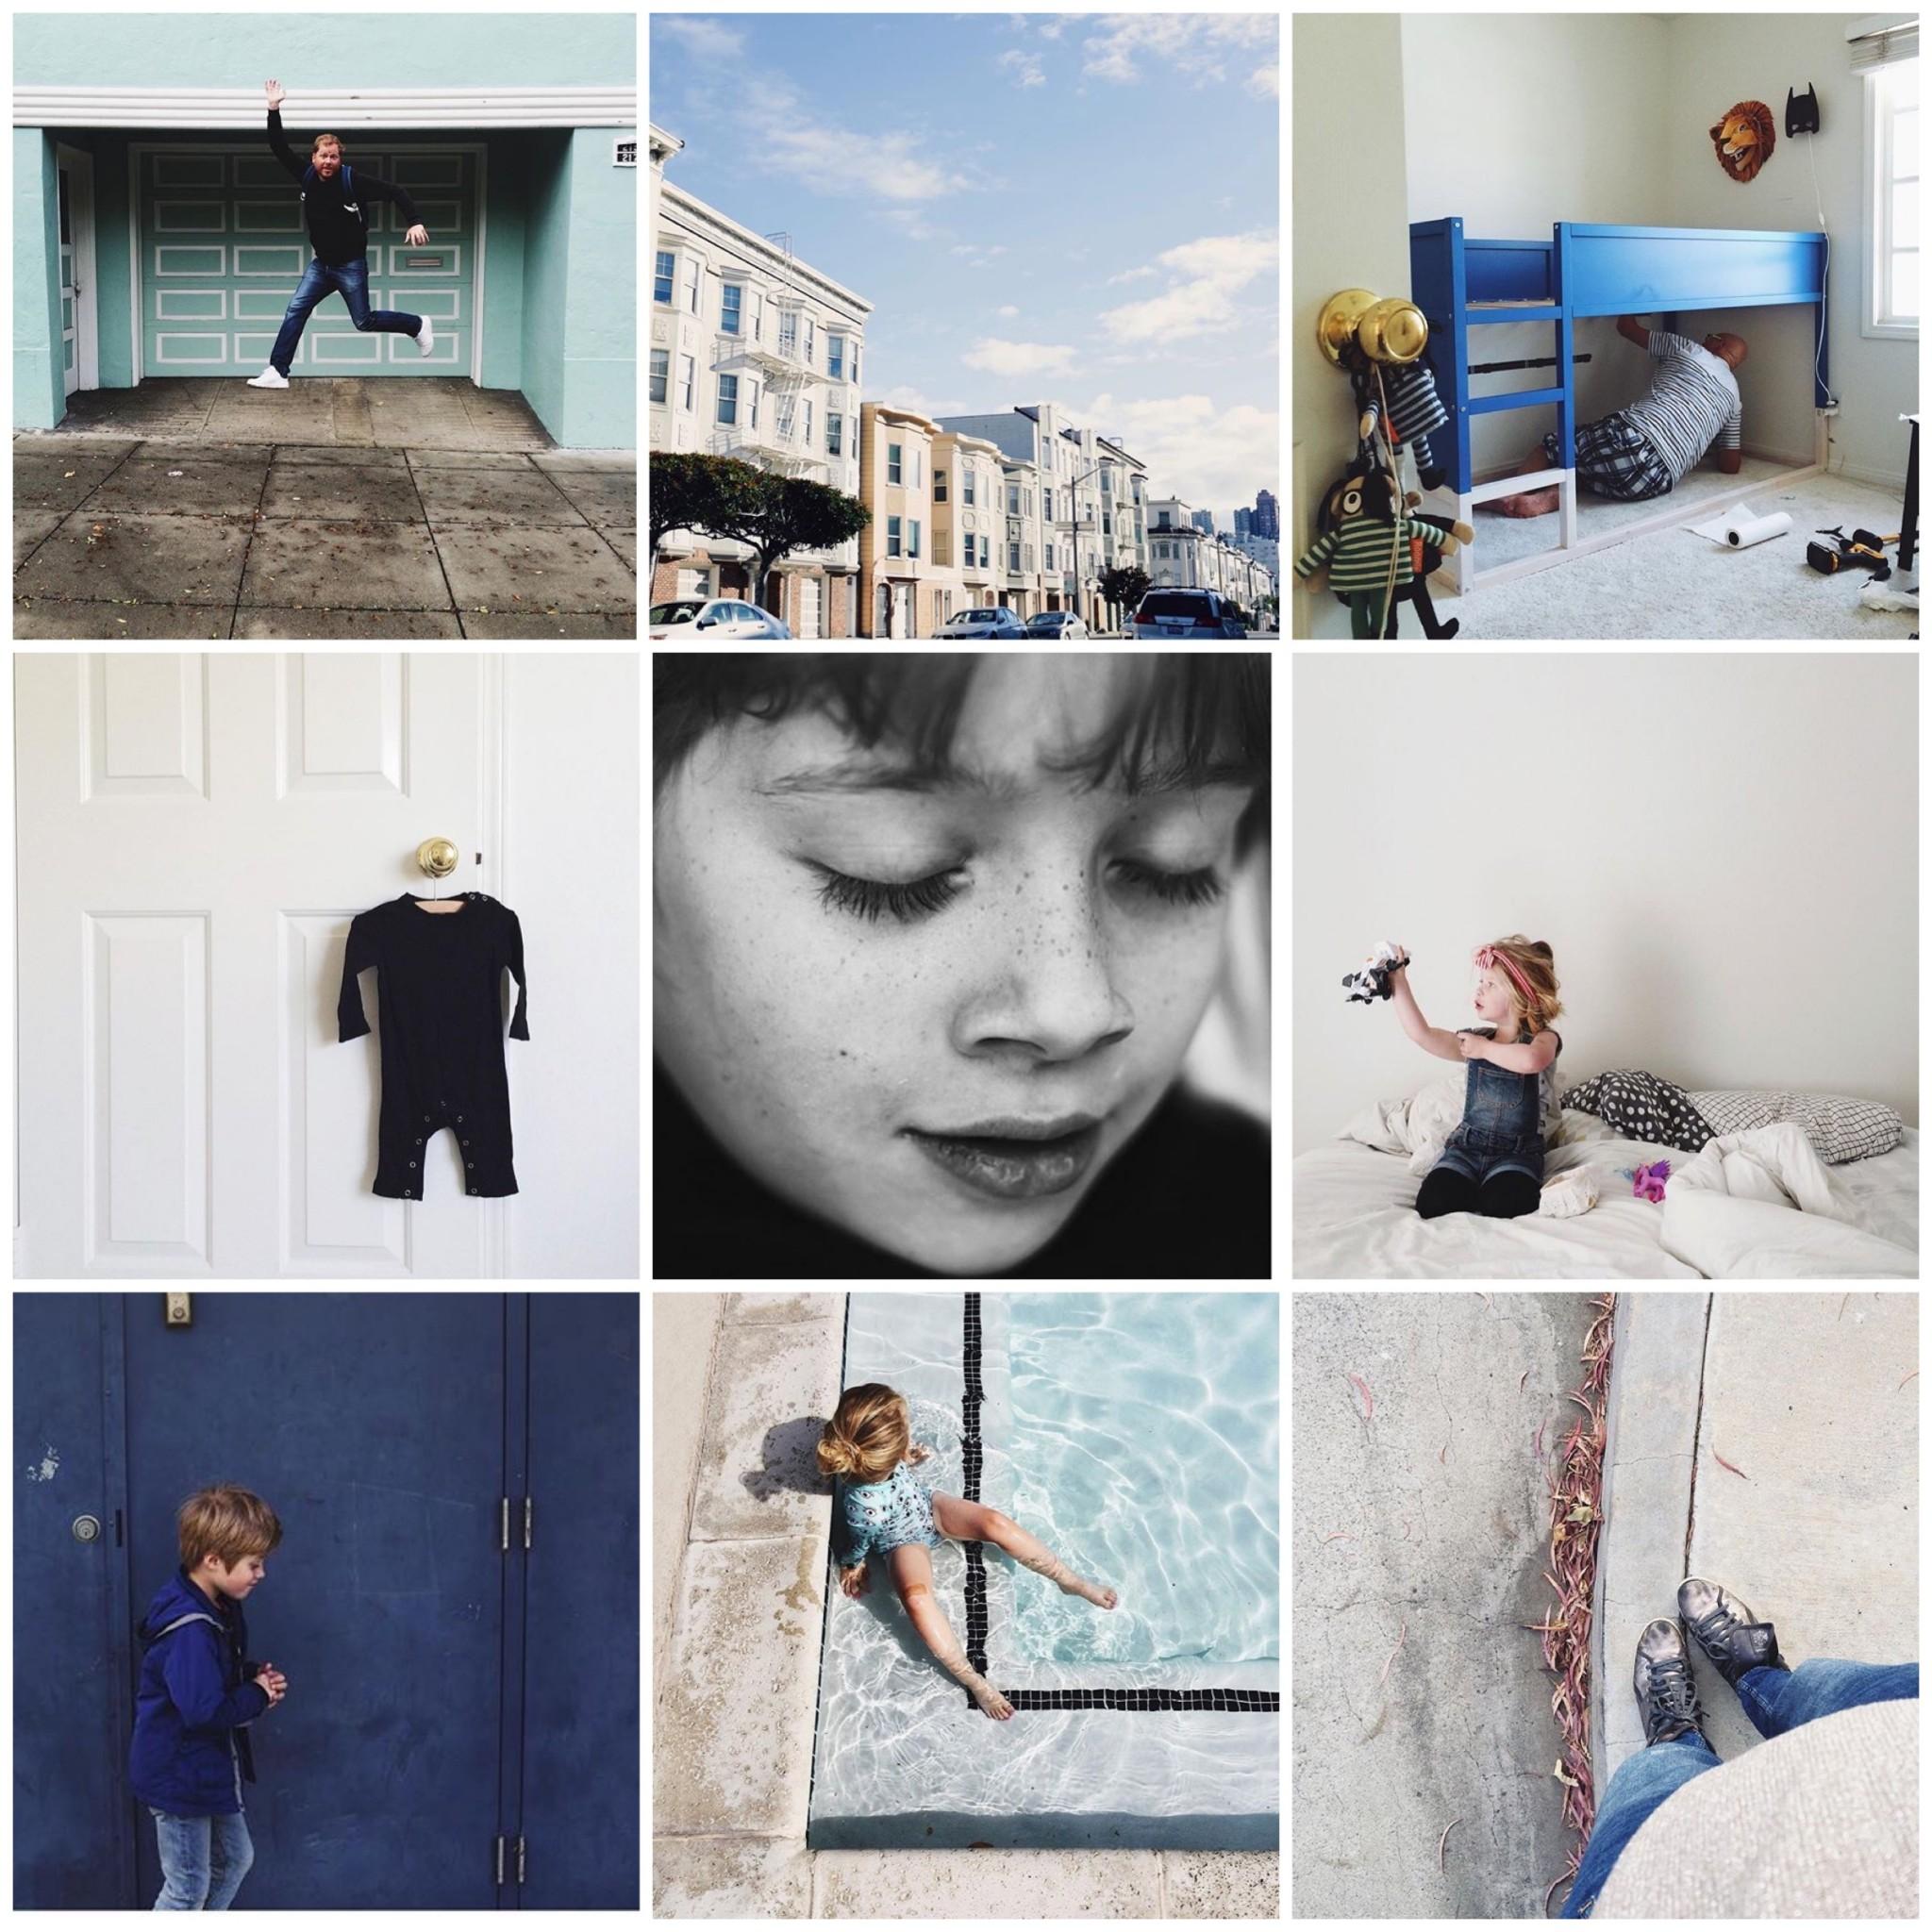 April on instagram @madebylon